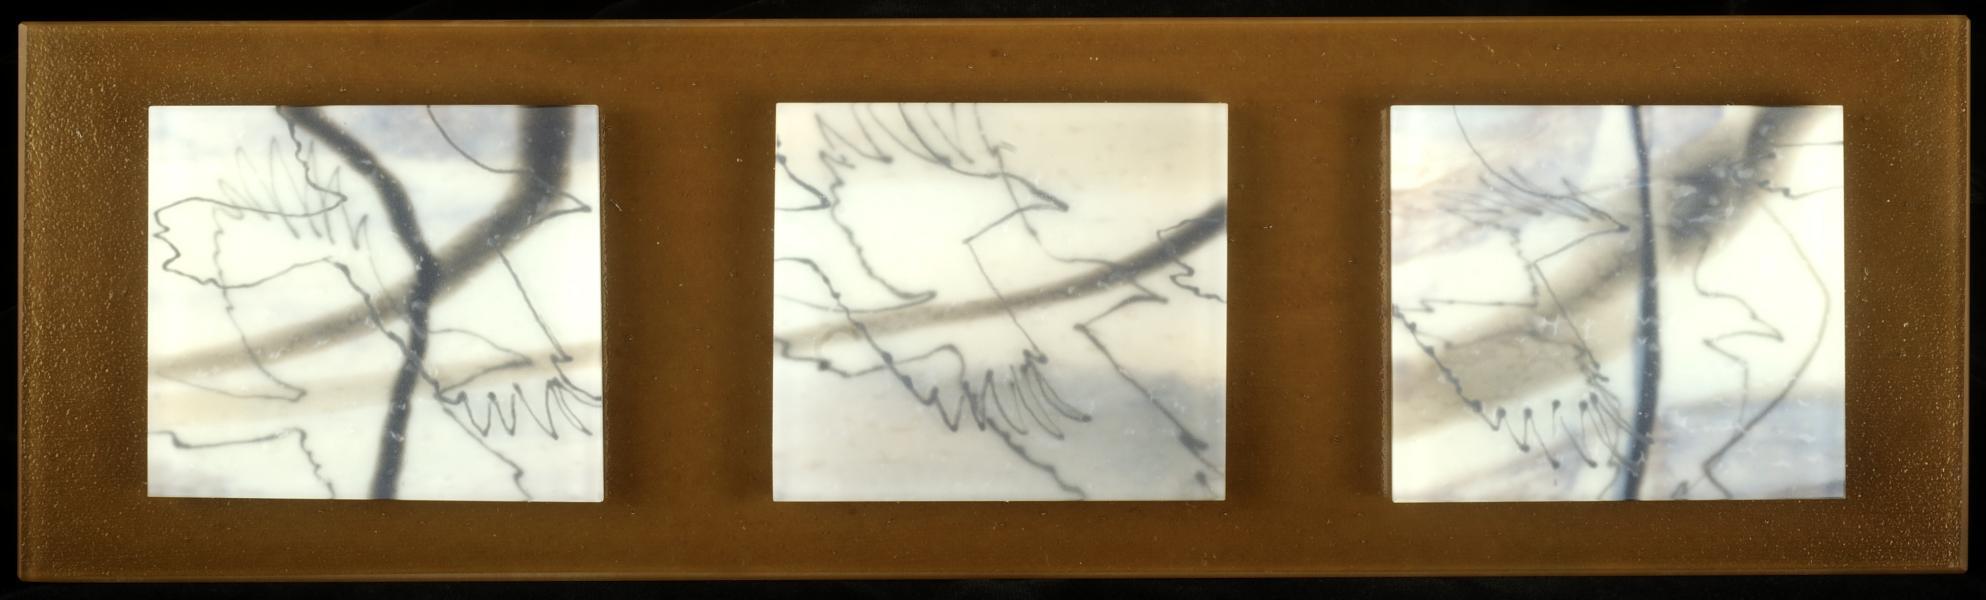 bird:corvus artwork